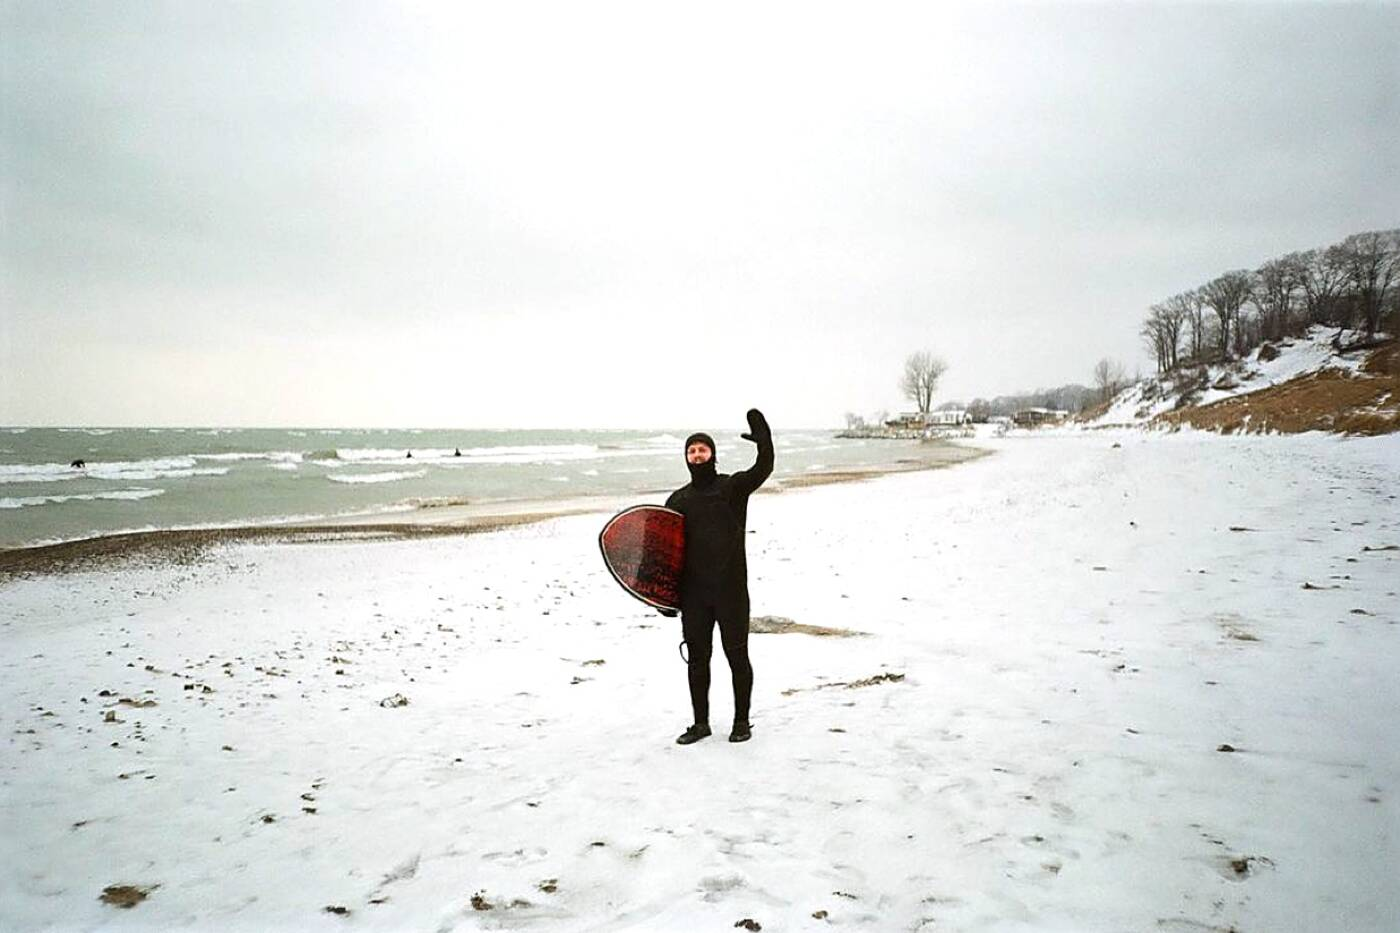 wayley surfing